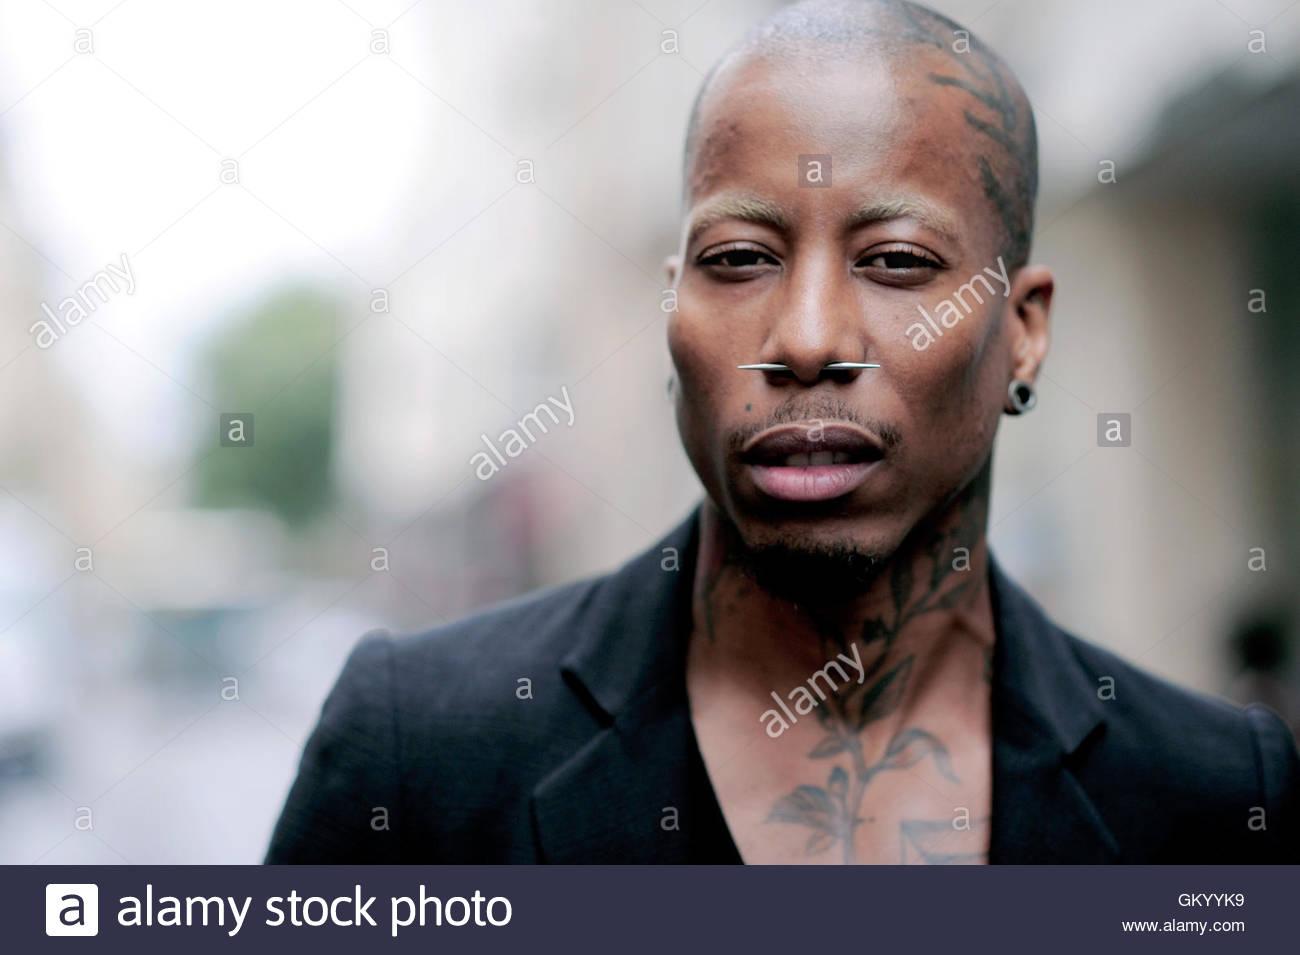 Tattooed man with nose piercing, Le Marais, Paris, France. - Stock Image